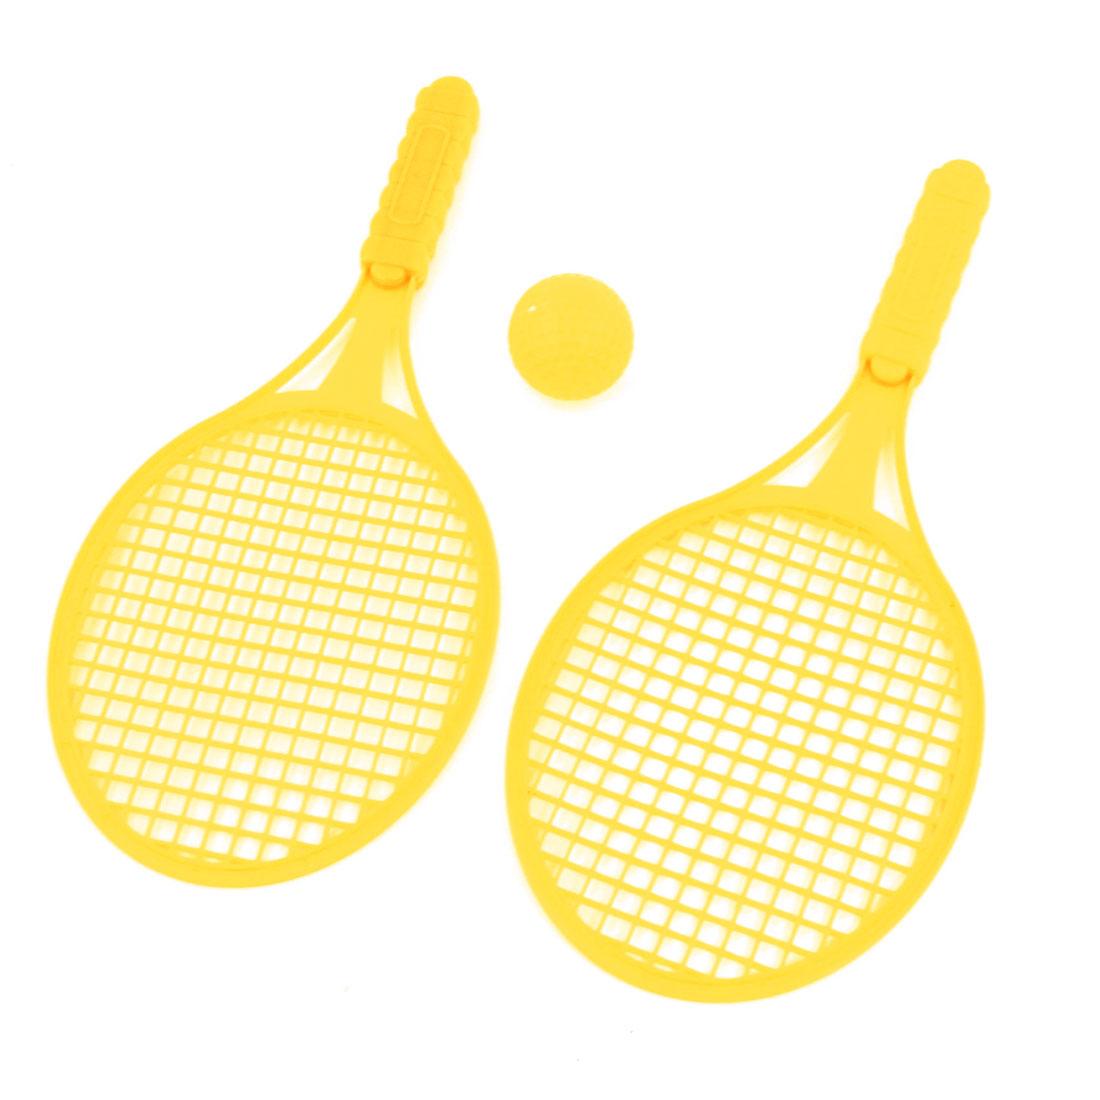 3 in 1 Yellow Nonslip Handle Tennis Racket Ball Sport Set for Kids